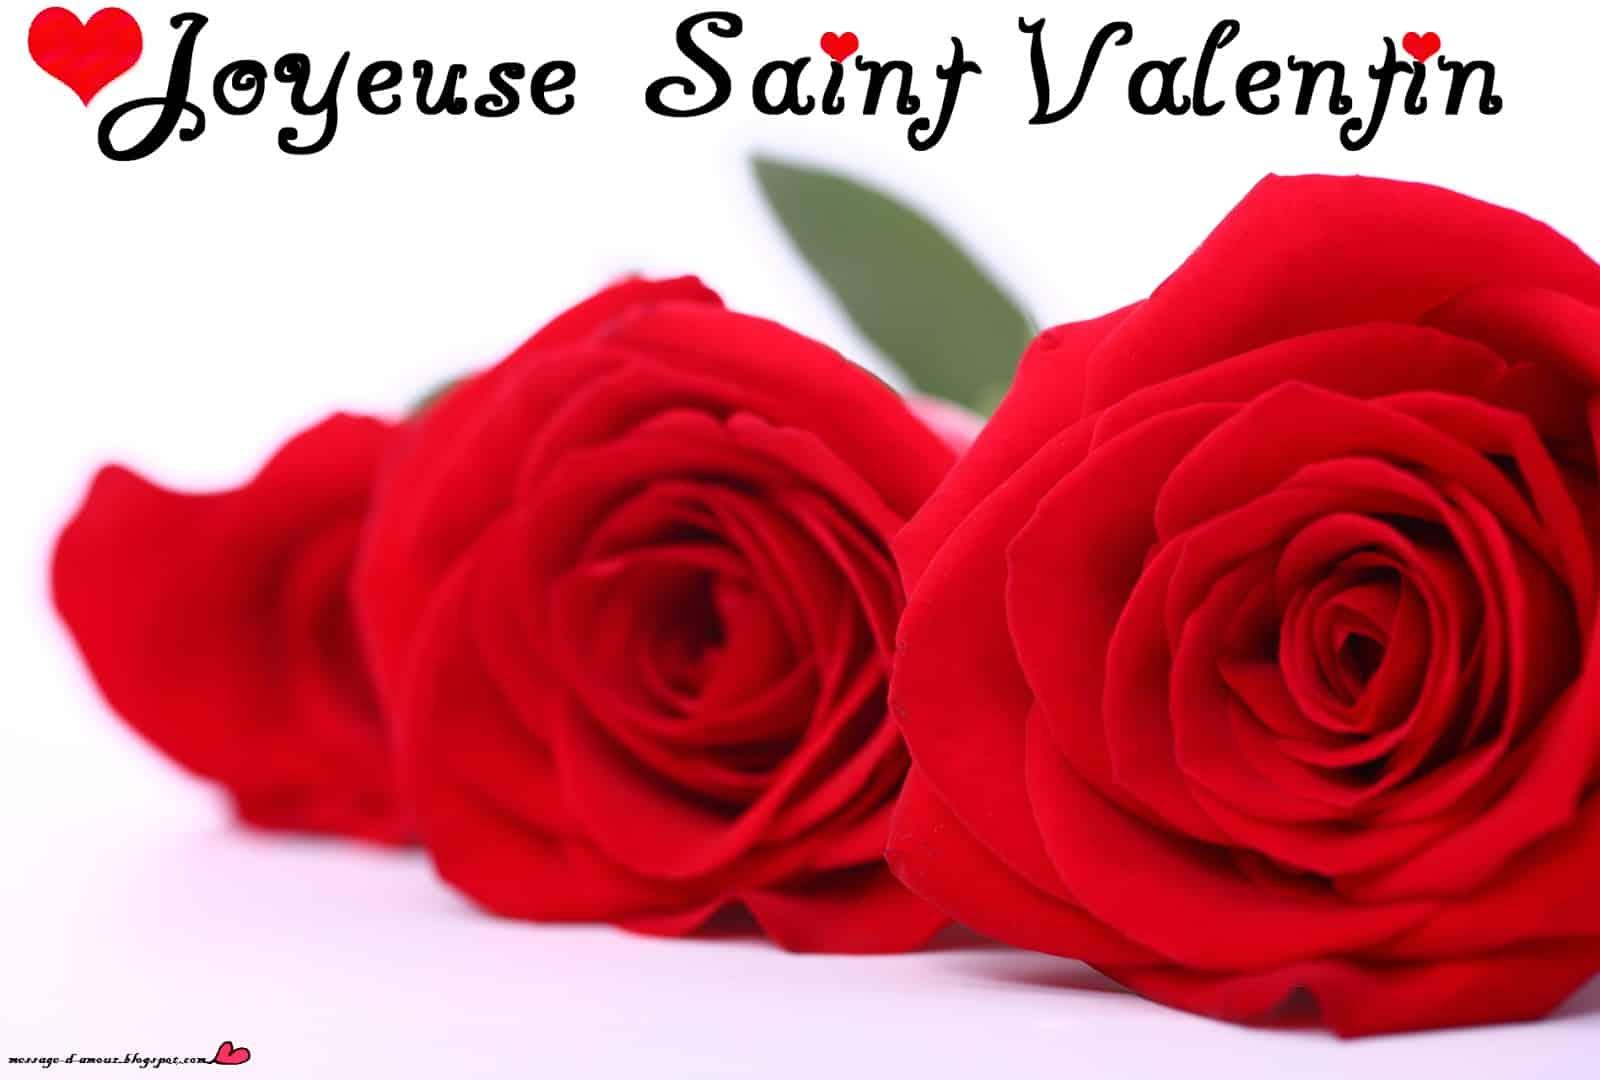 Carte joyeuse Saint Valentin trois roses